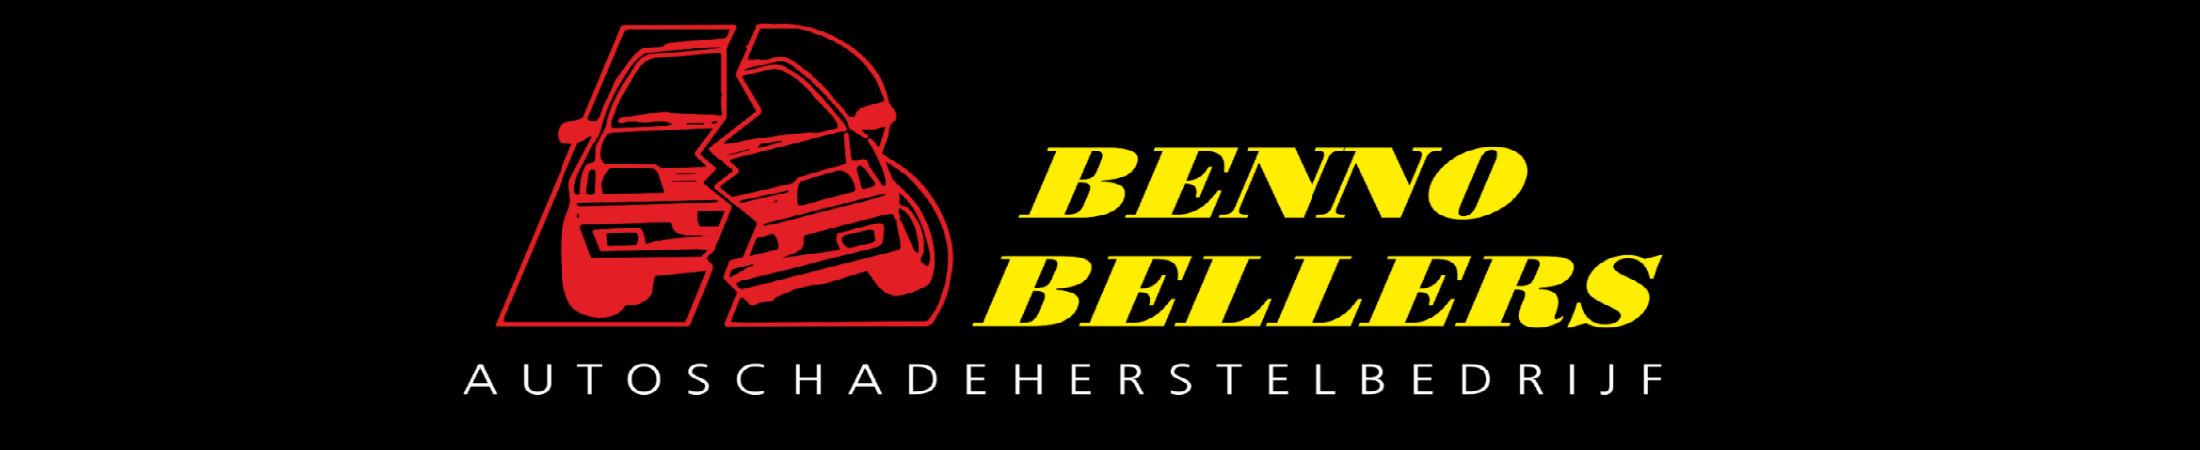 Bellers Autoschade